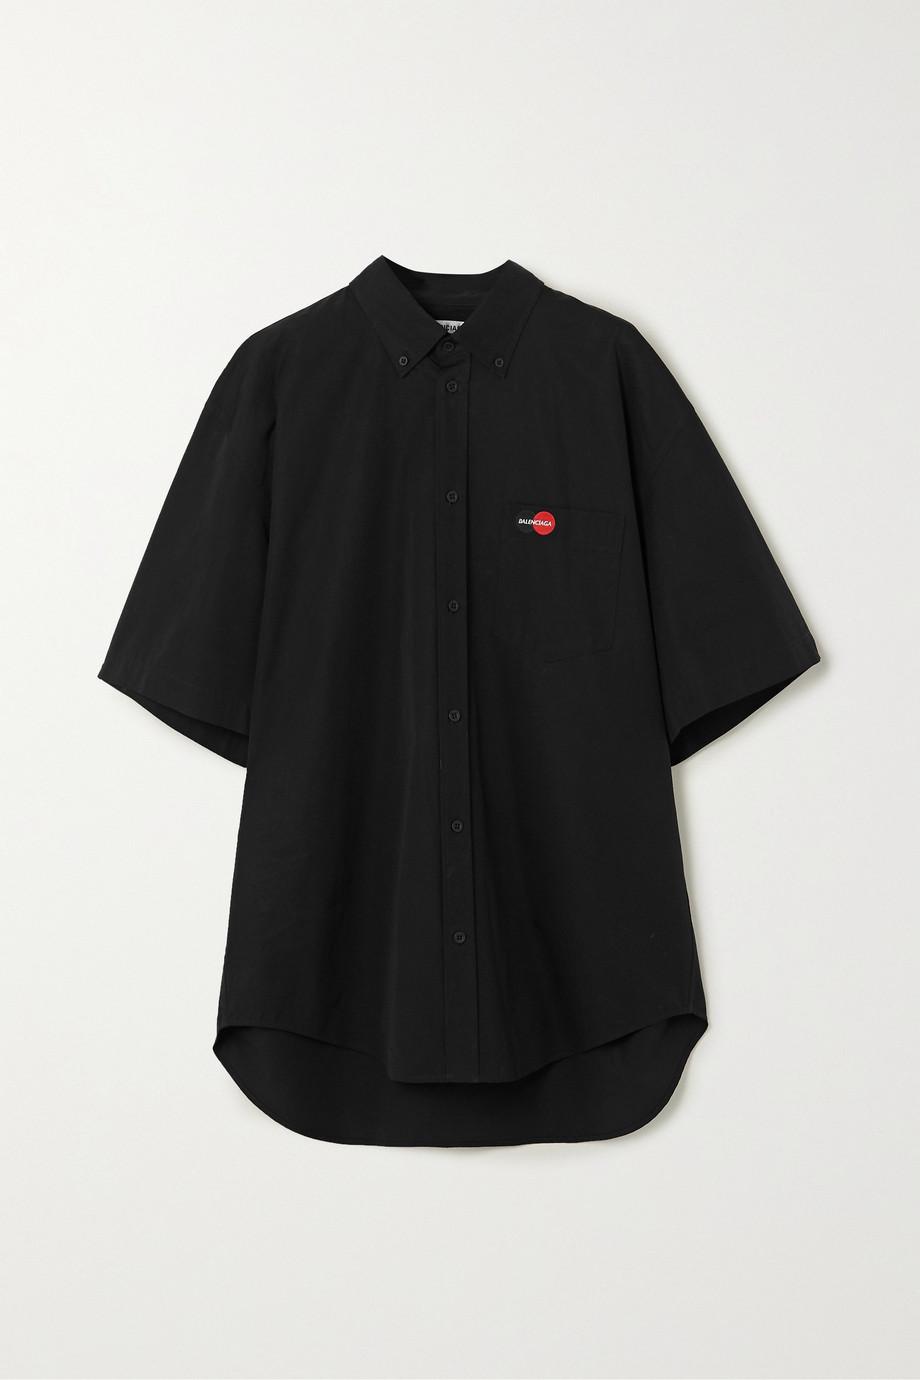 Balenciaga Chemise en coton à broderies